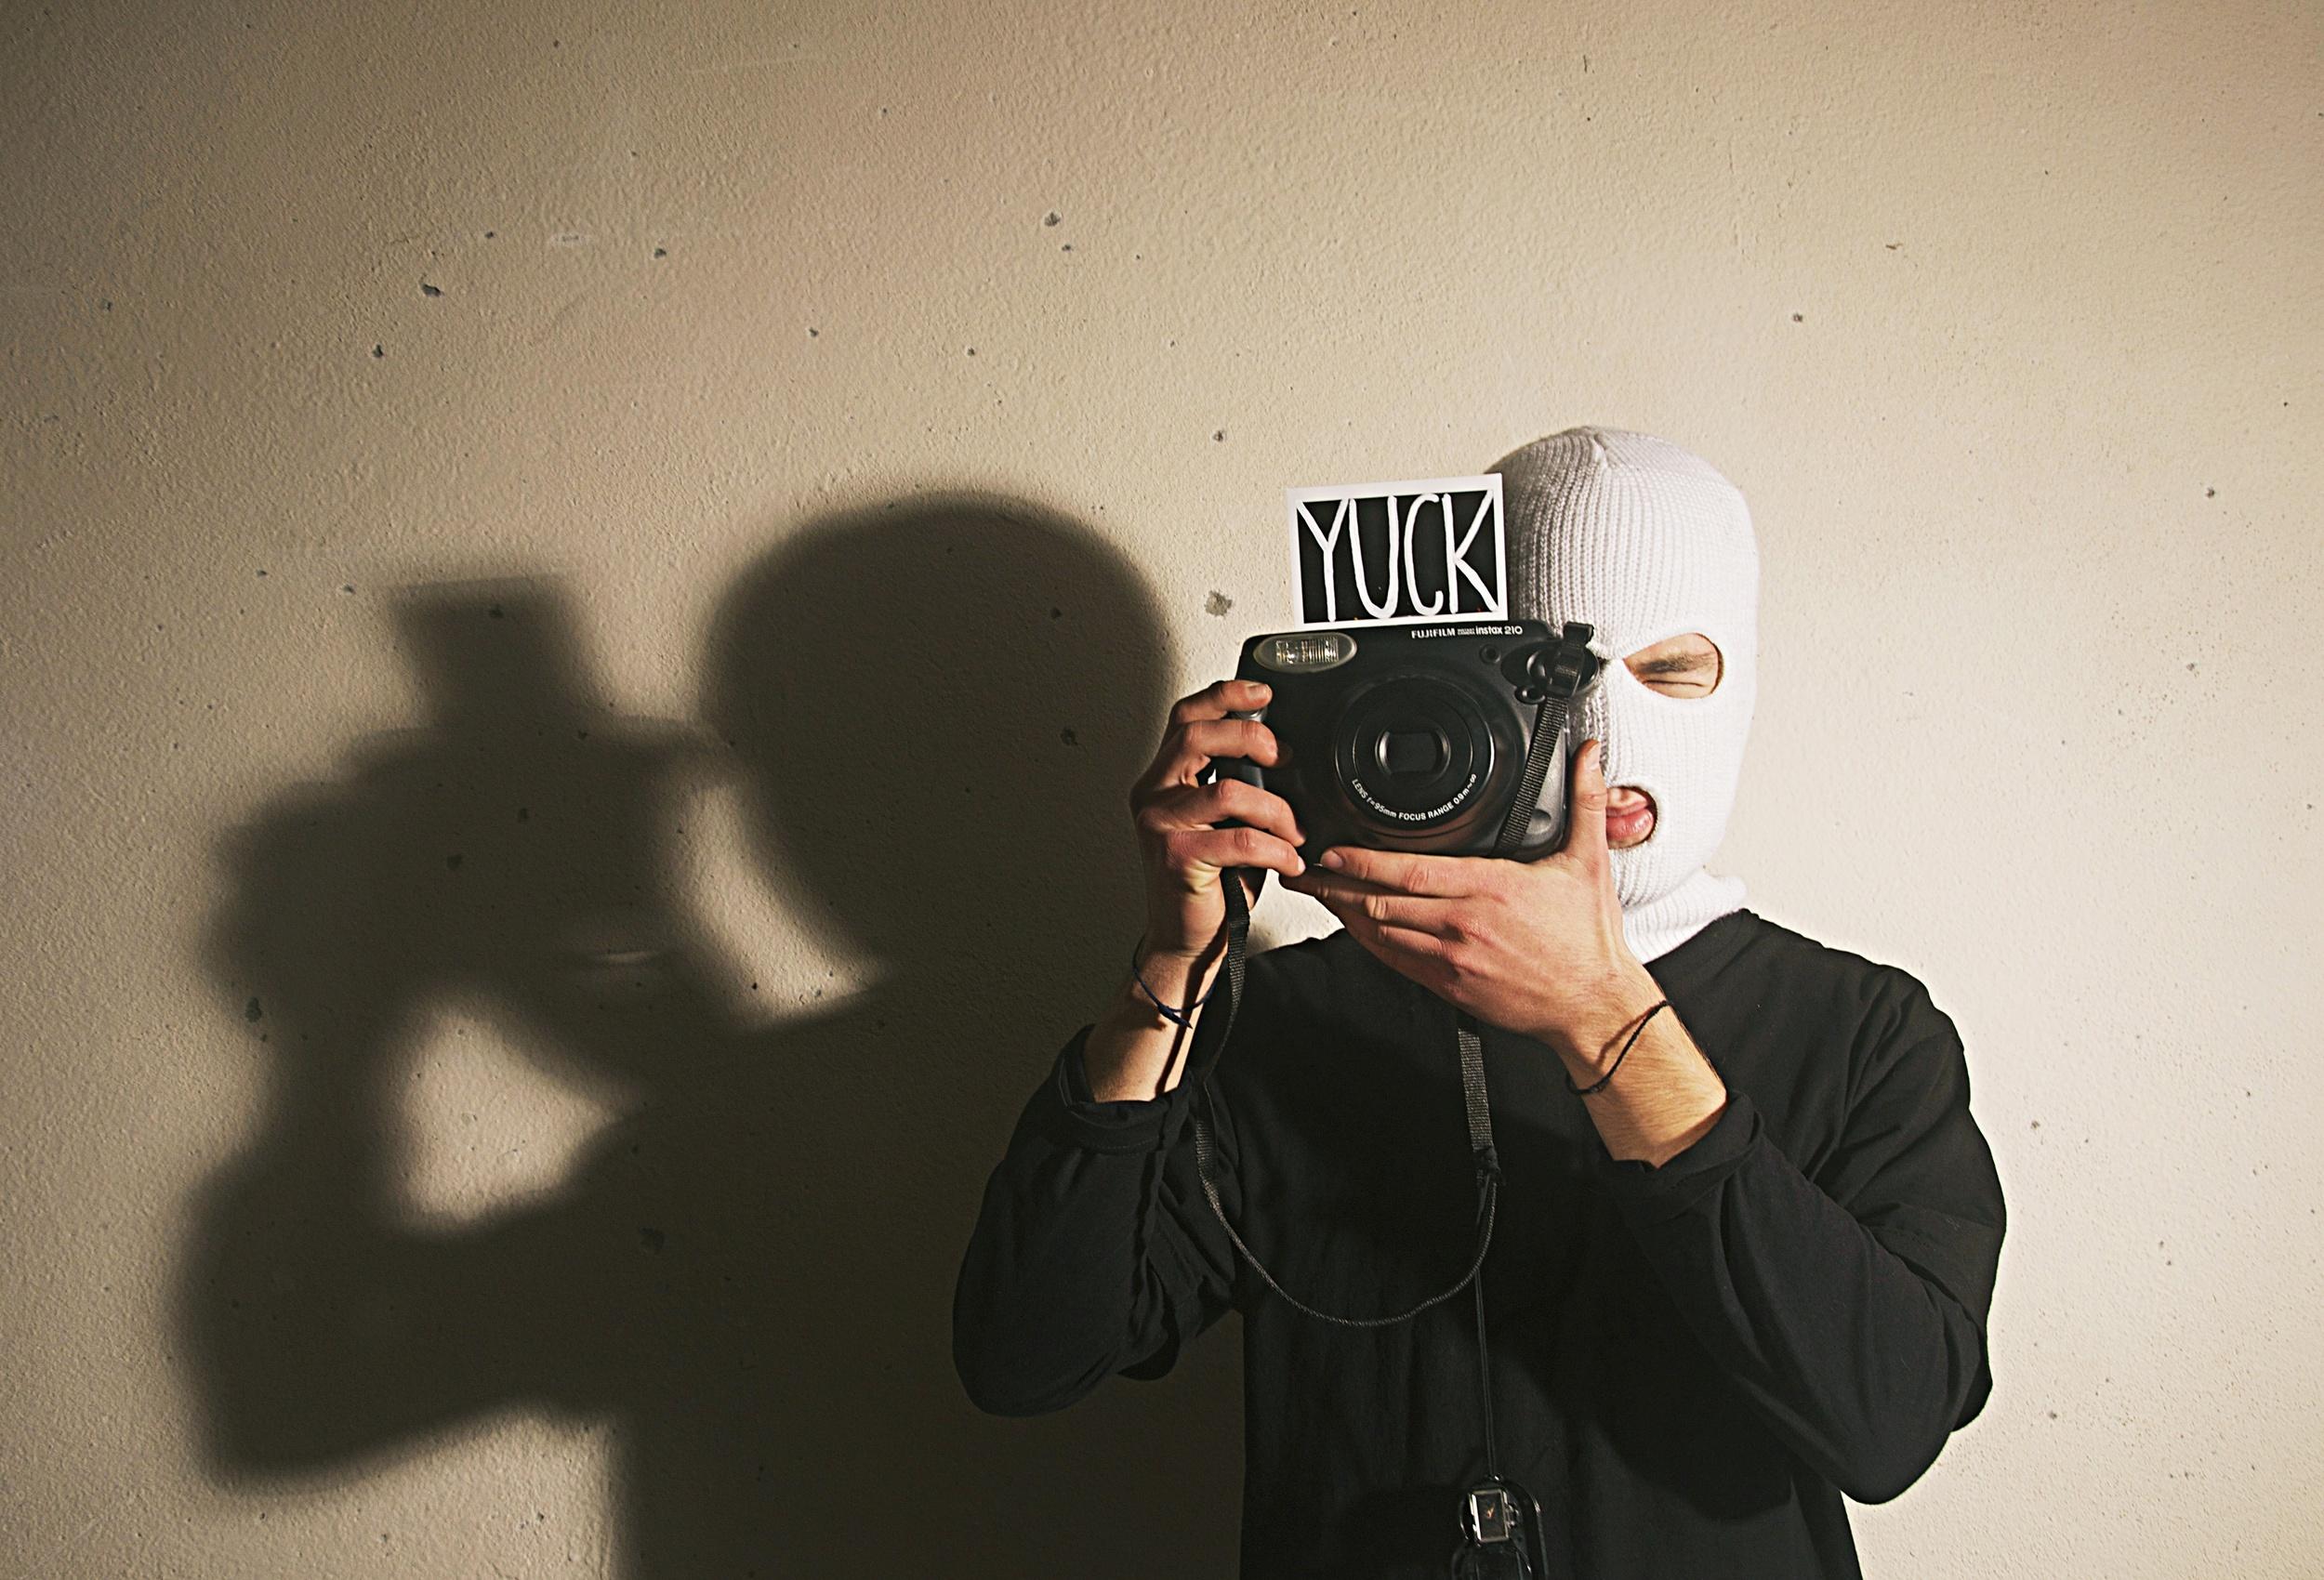 Yuck 2  by Nika Maciazek